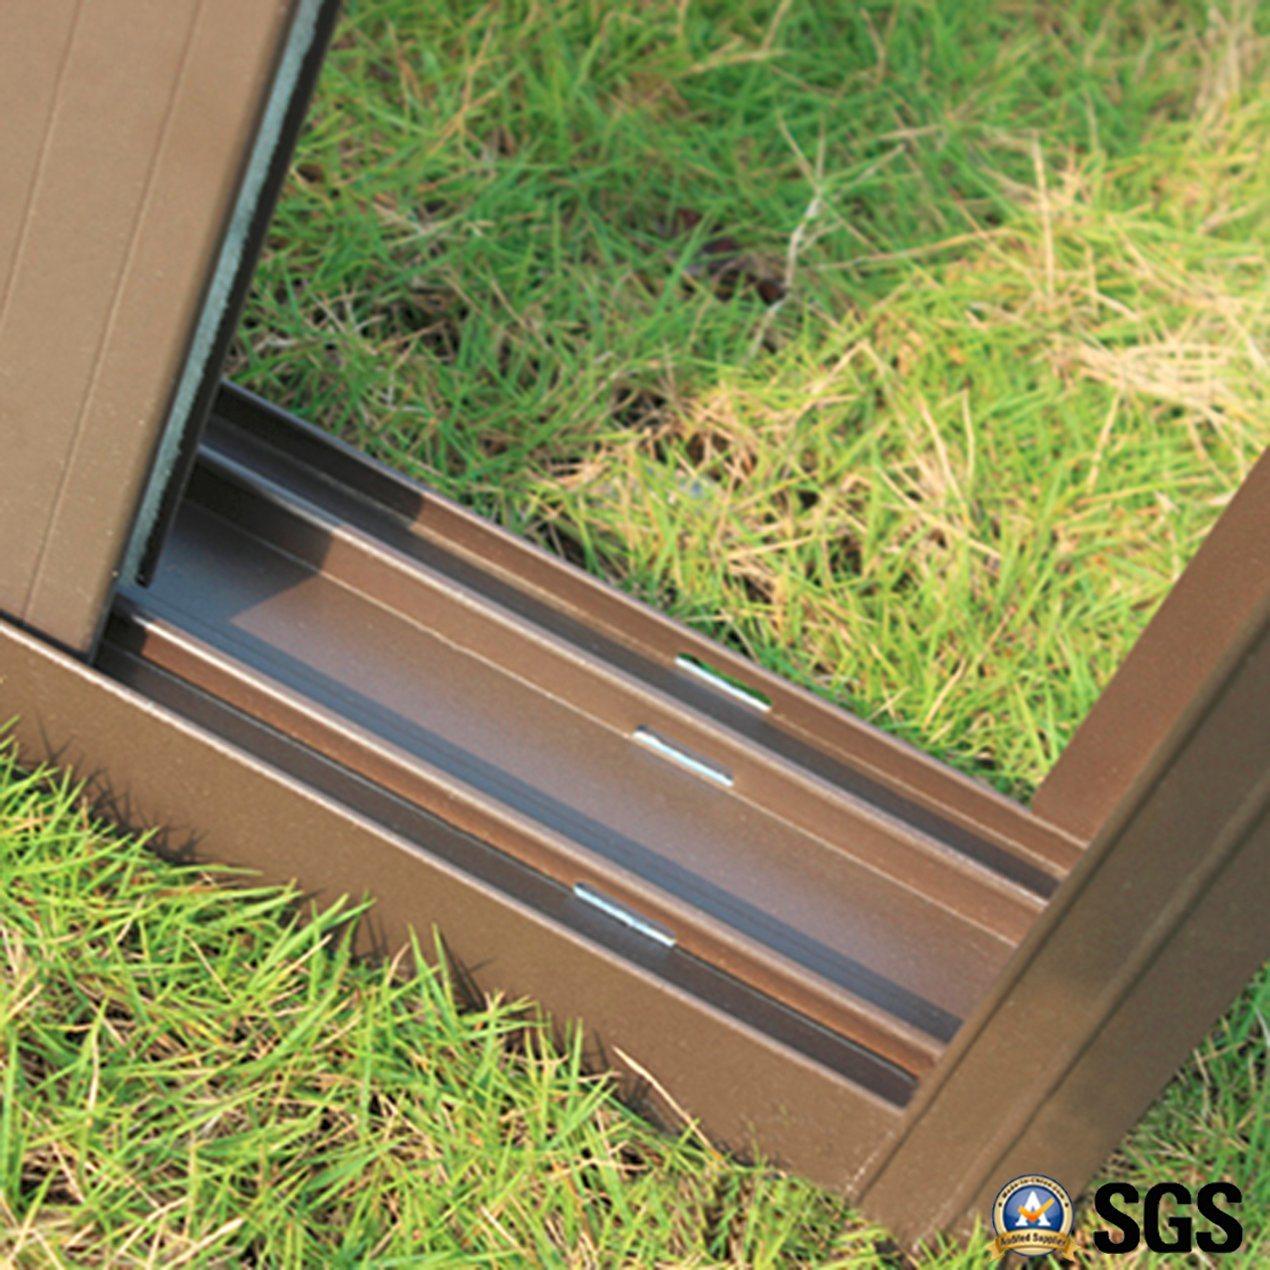 Powder Coated Aluminium Sliding Window with Fix, Latch Lock, Aluminum Sliding Window K01009